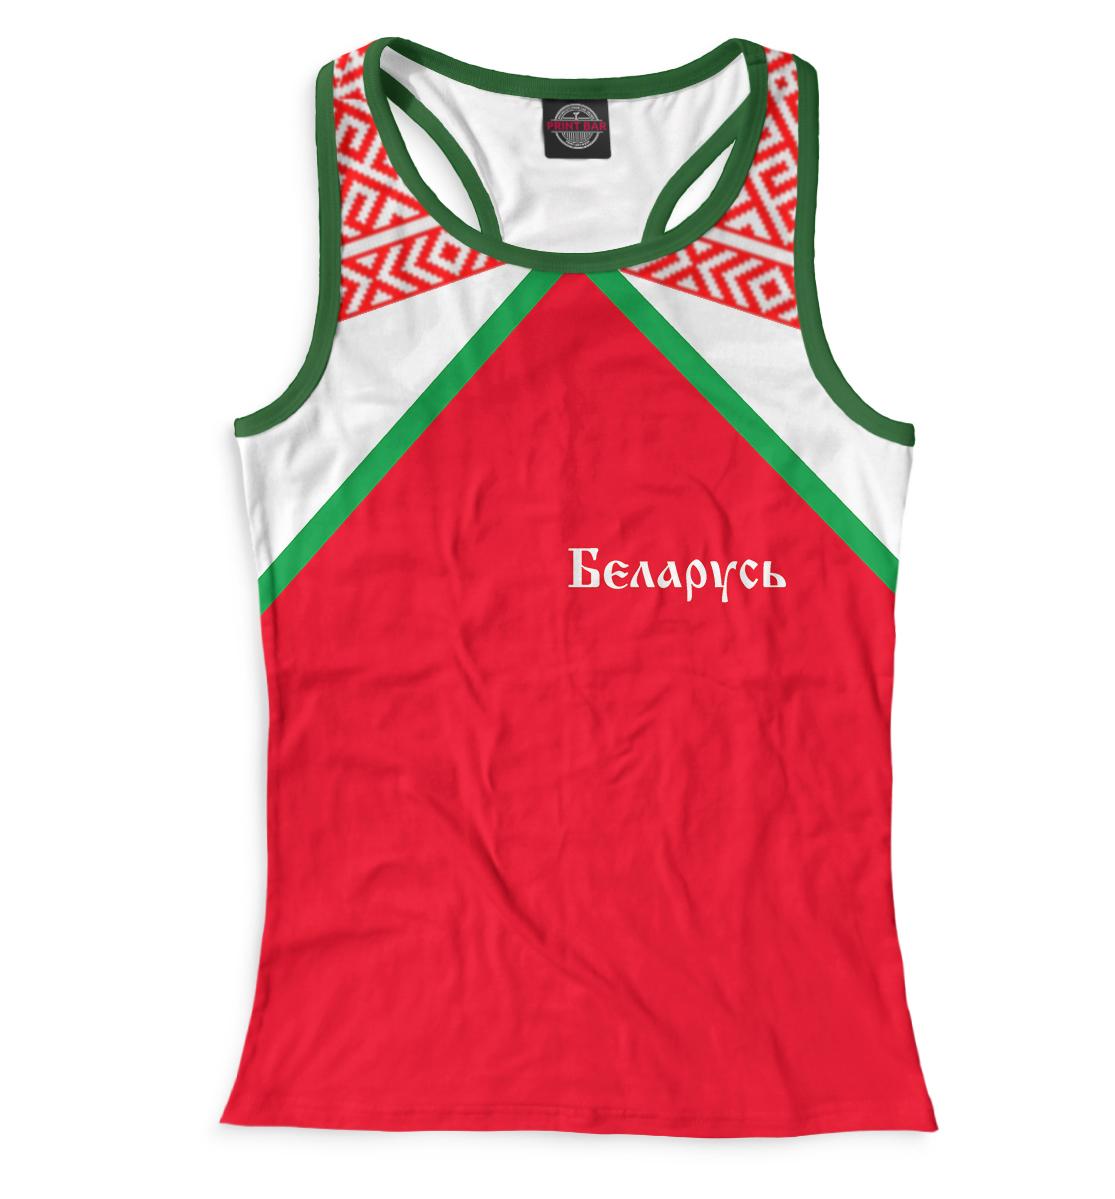 Купить Беларусь, Printbar, Майки борцовки, BLR-135830-mayb-1